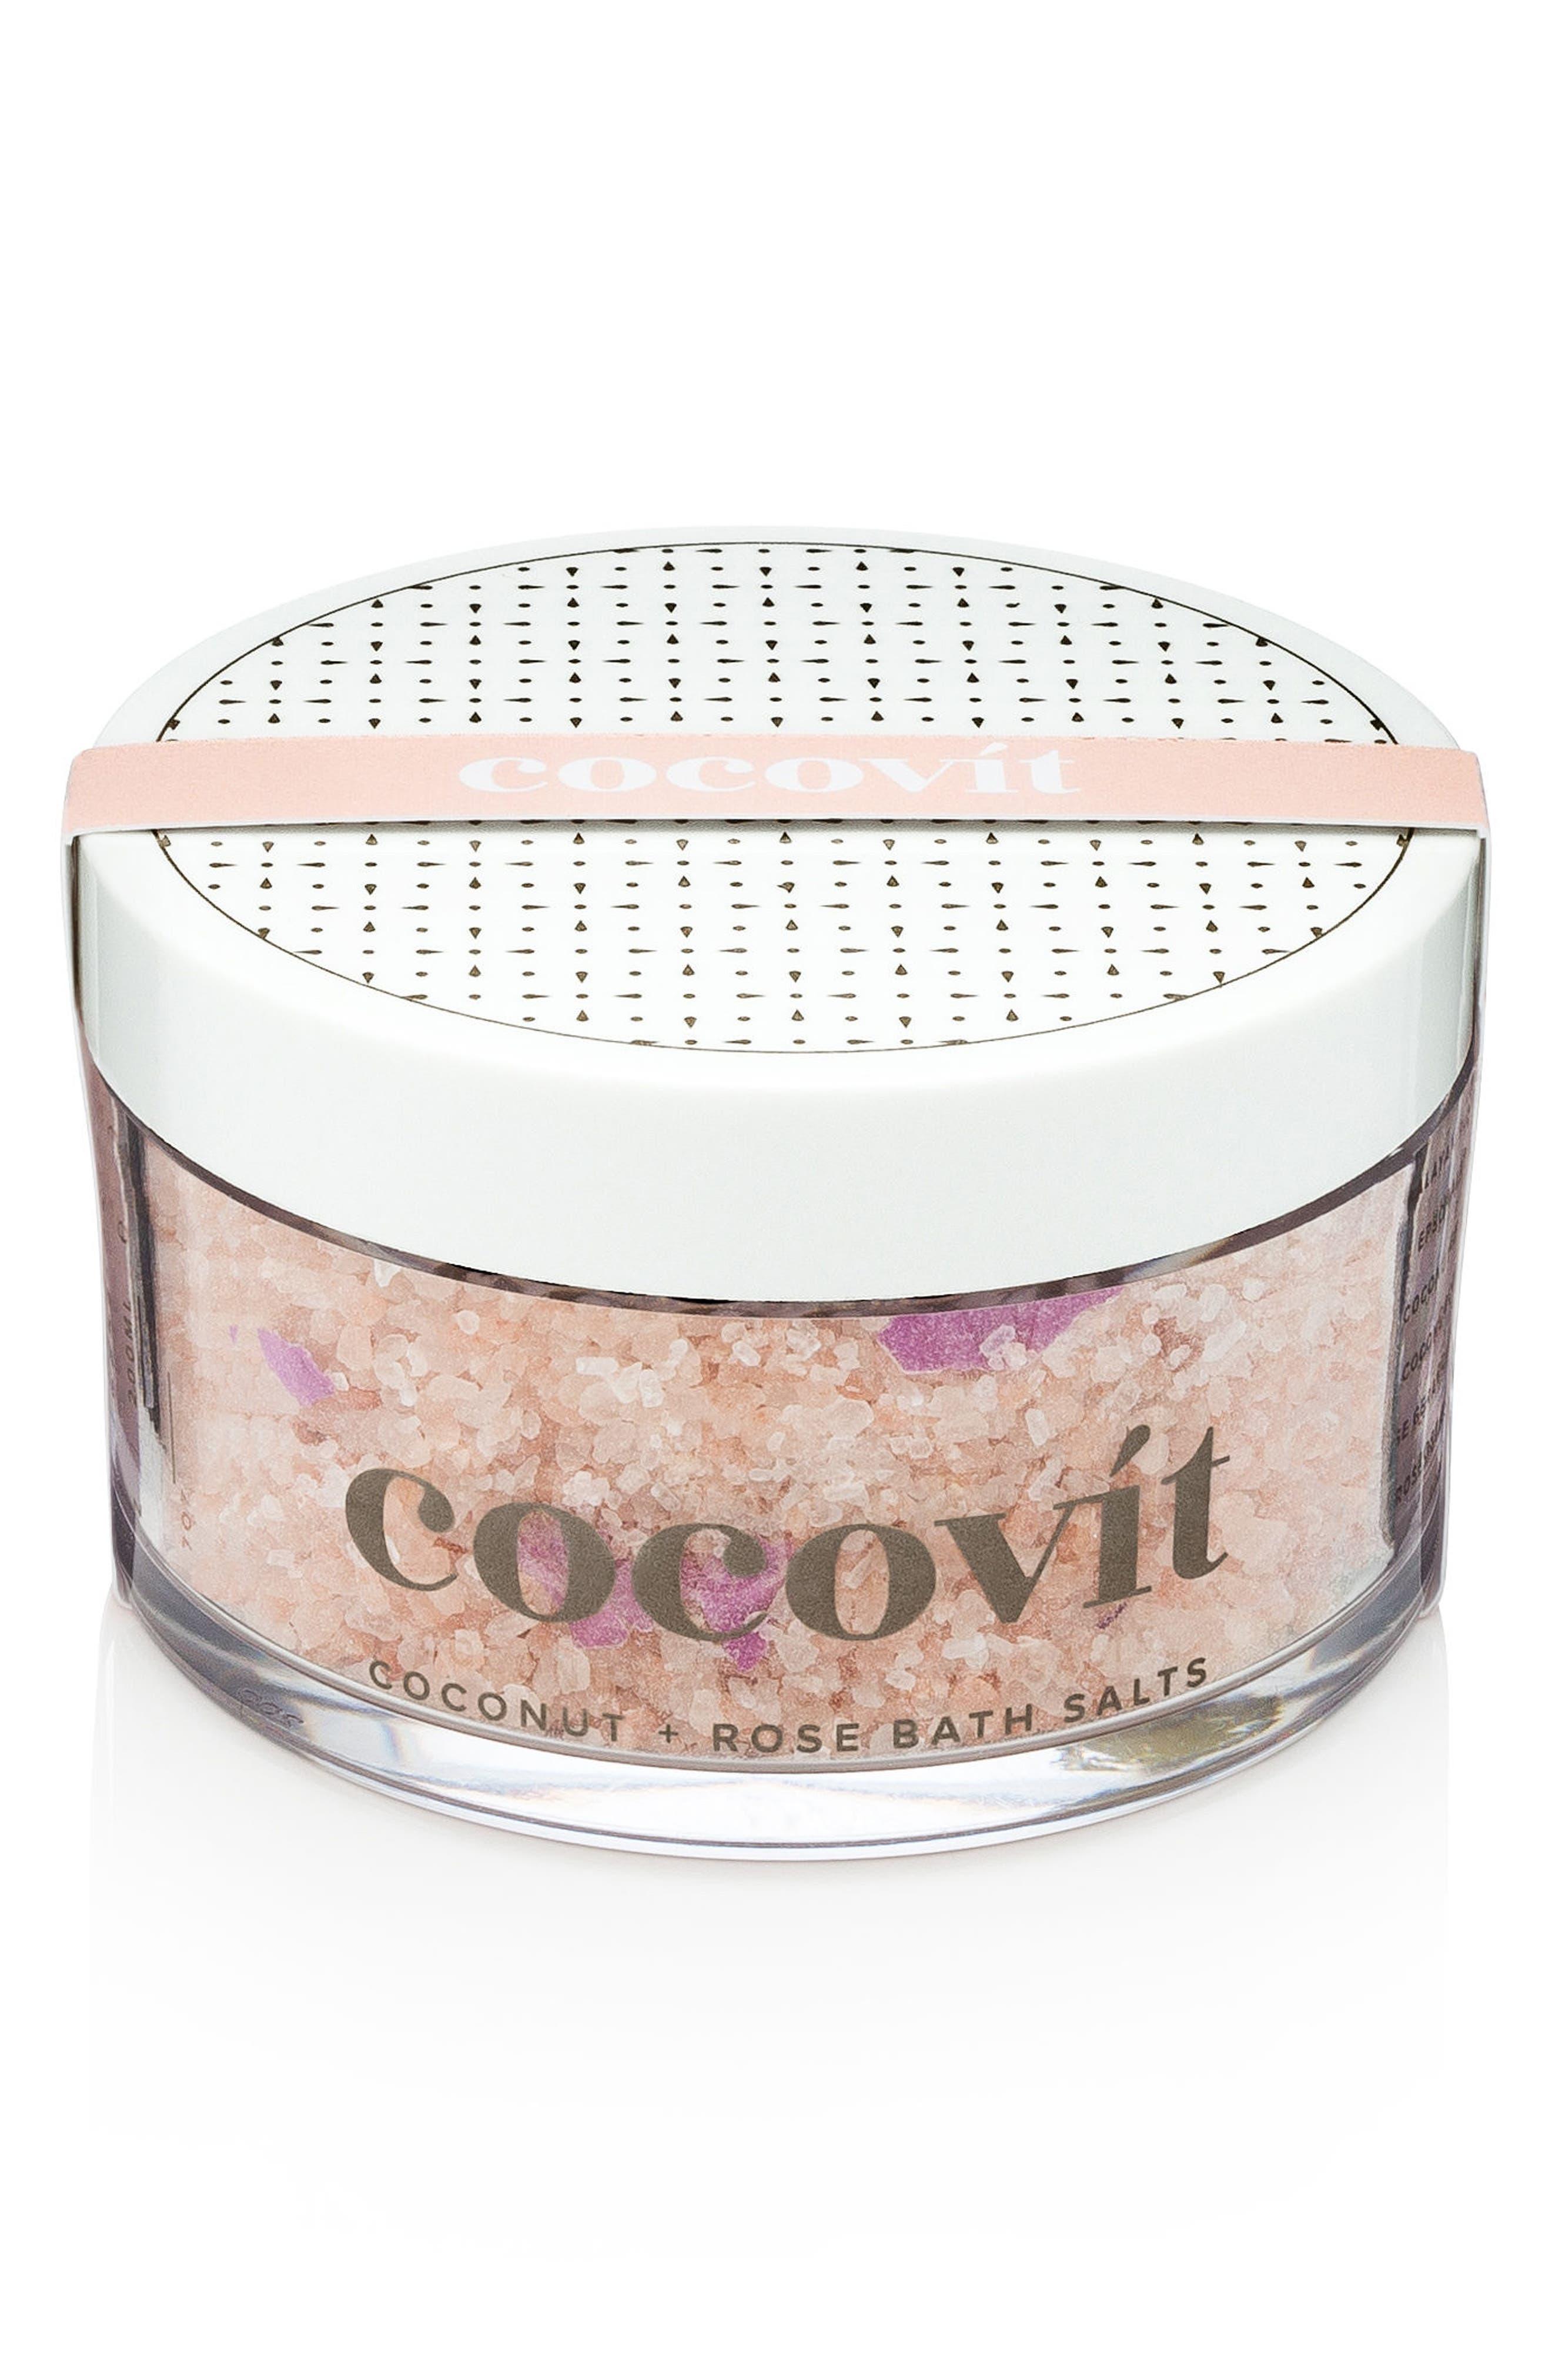 Coconut + Rose Bath Salts,                             Main thumbnail 1, color,                             000